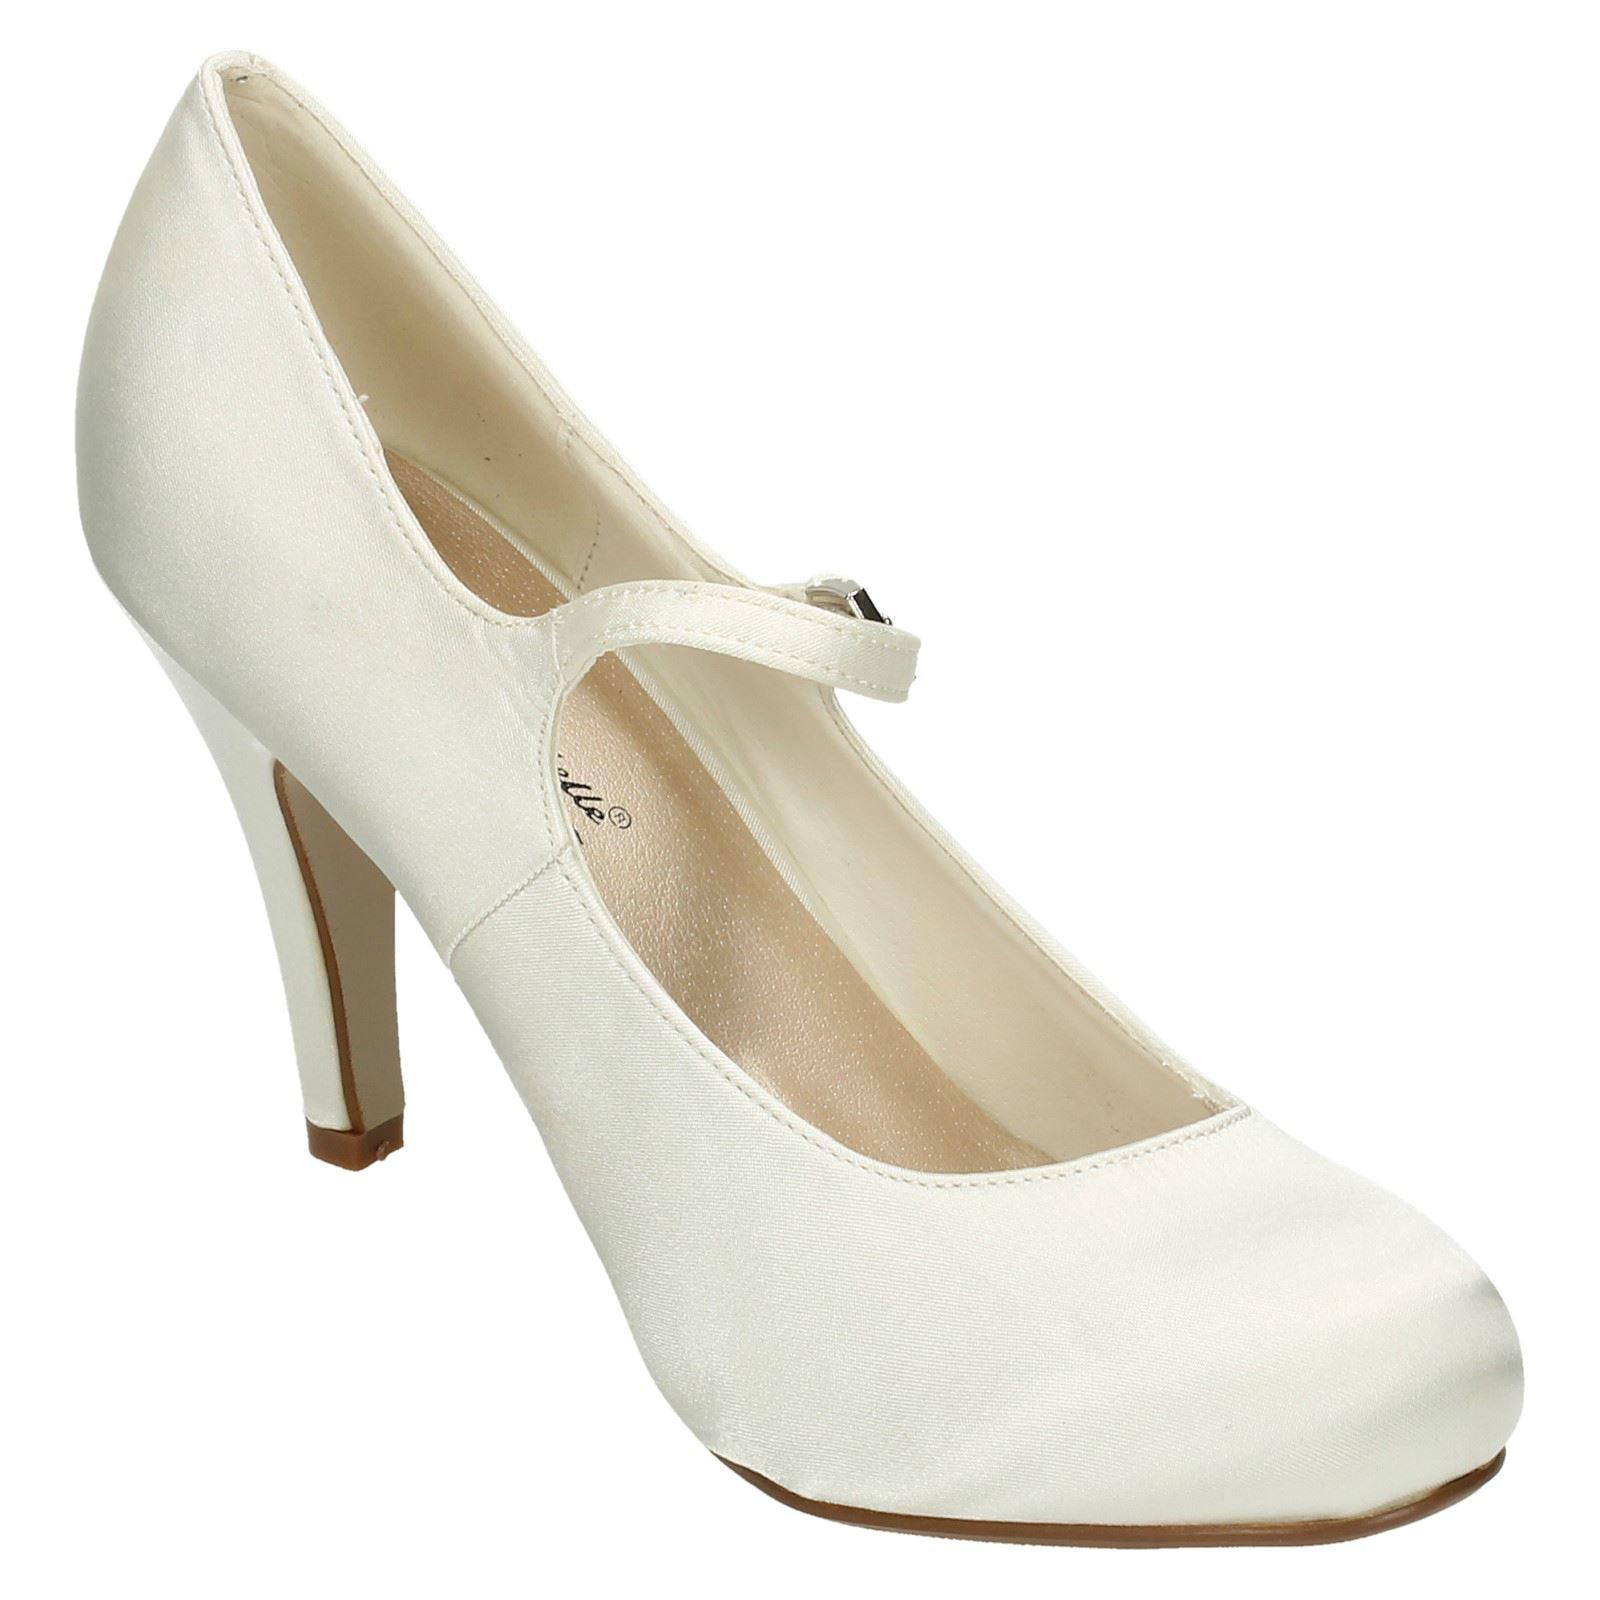 ladies anne michelle high heel round toe satin court shoe. Black Bedroom Furniture Sets. Home Design Ideas